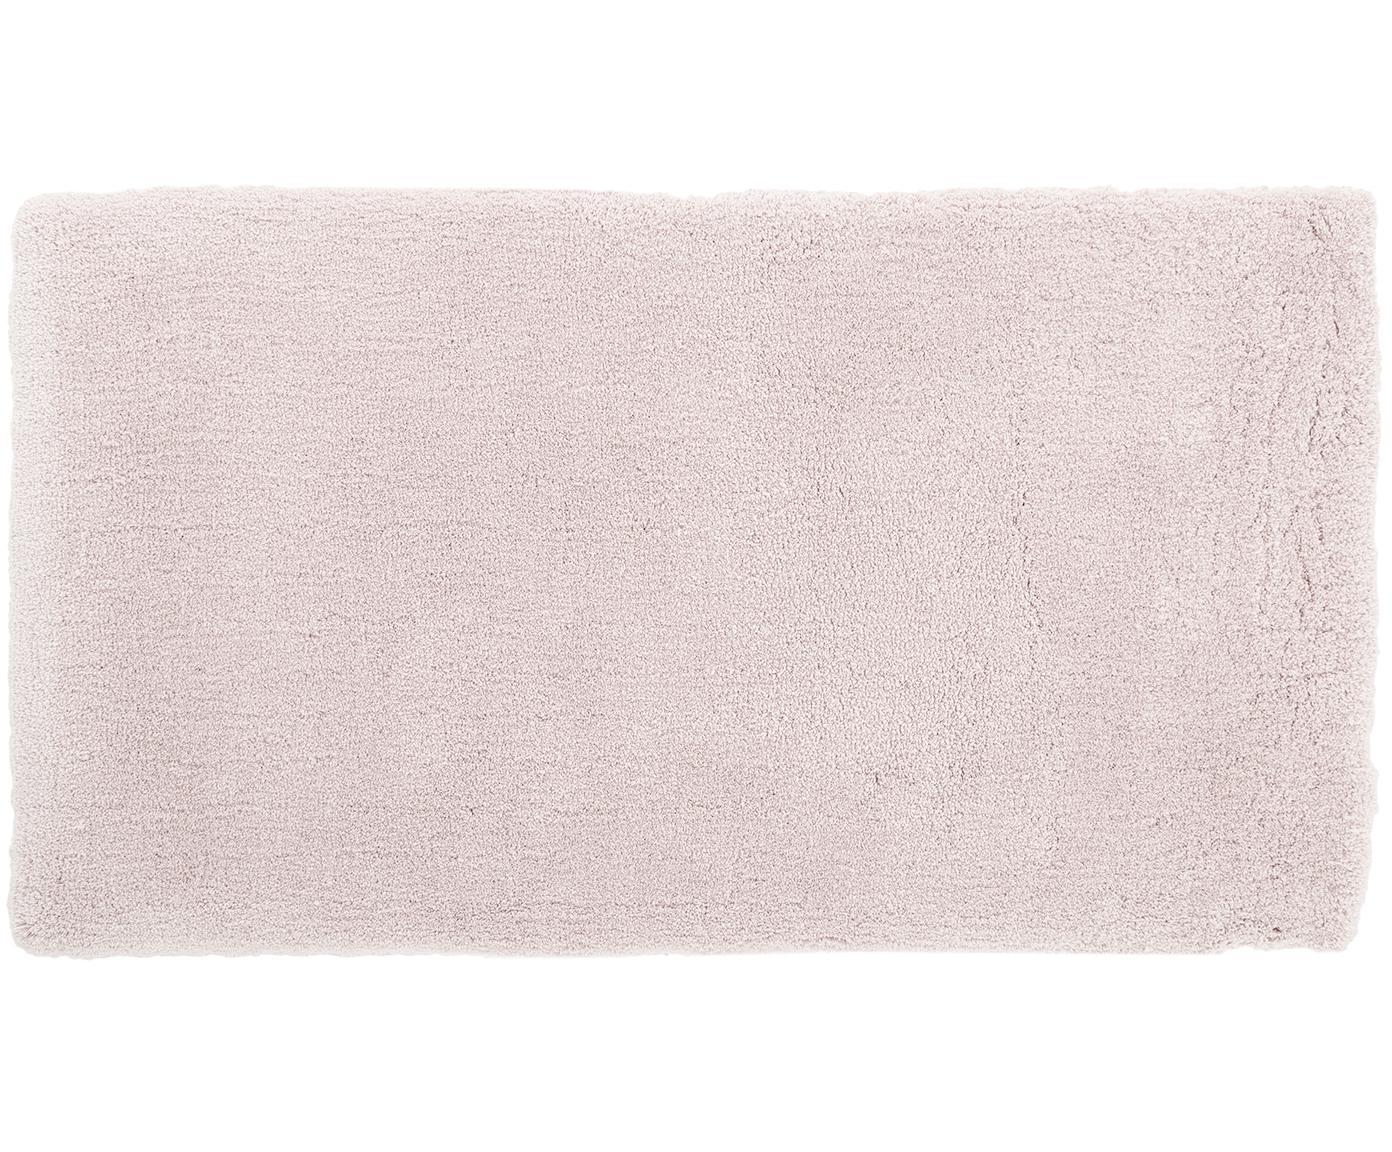 Pluizig hoogpolig vloerkleed Leighton in roze, Bovenzijde: 100% polyester (microveze, Onderzijde: 100% polyester, Roze, 80 x 150 cm